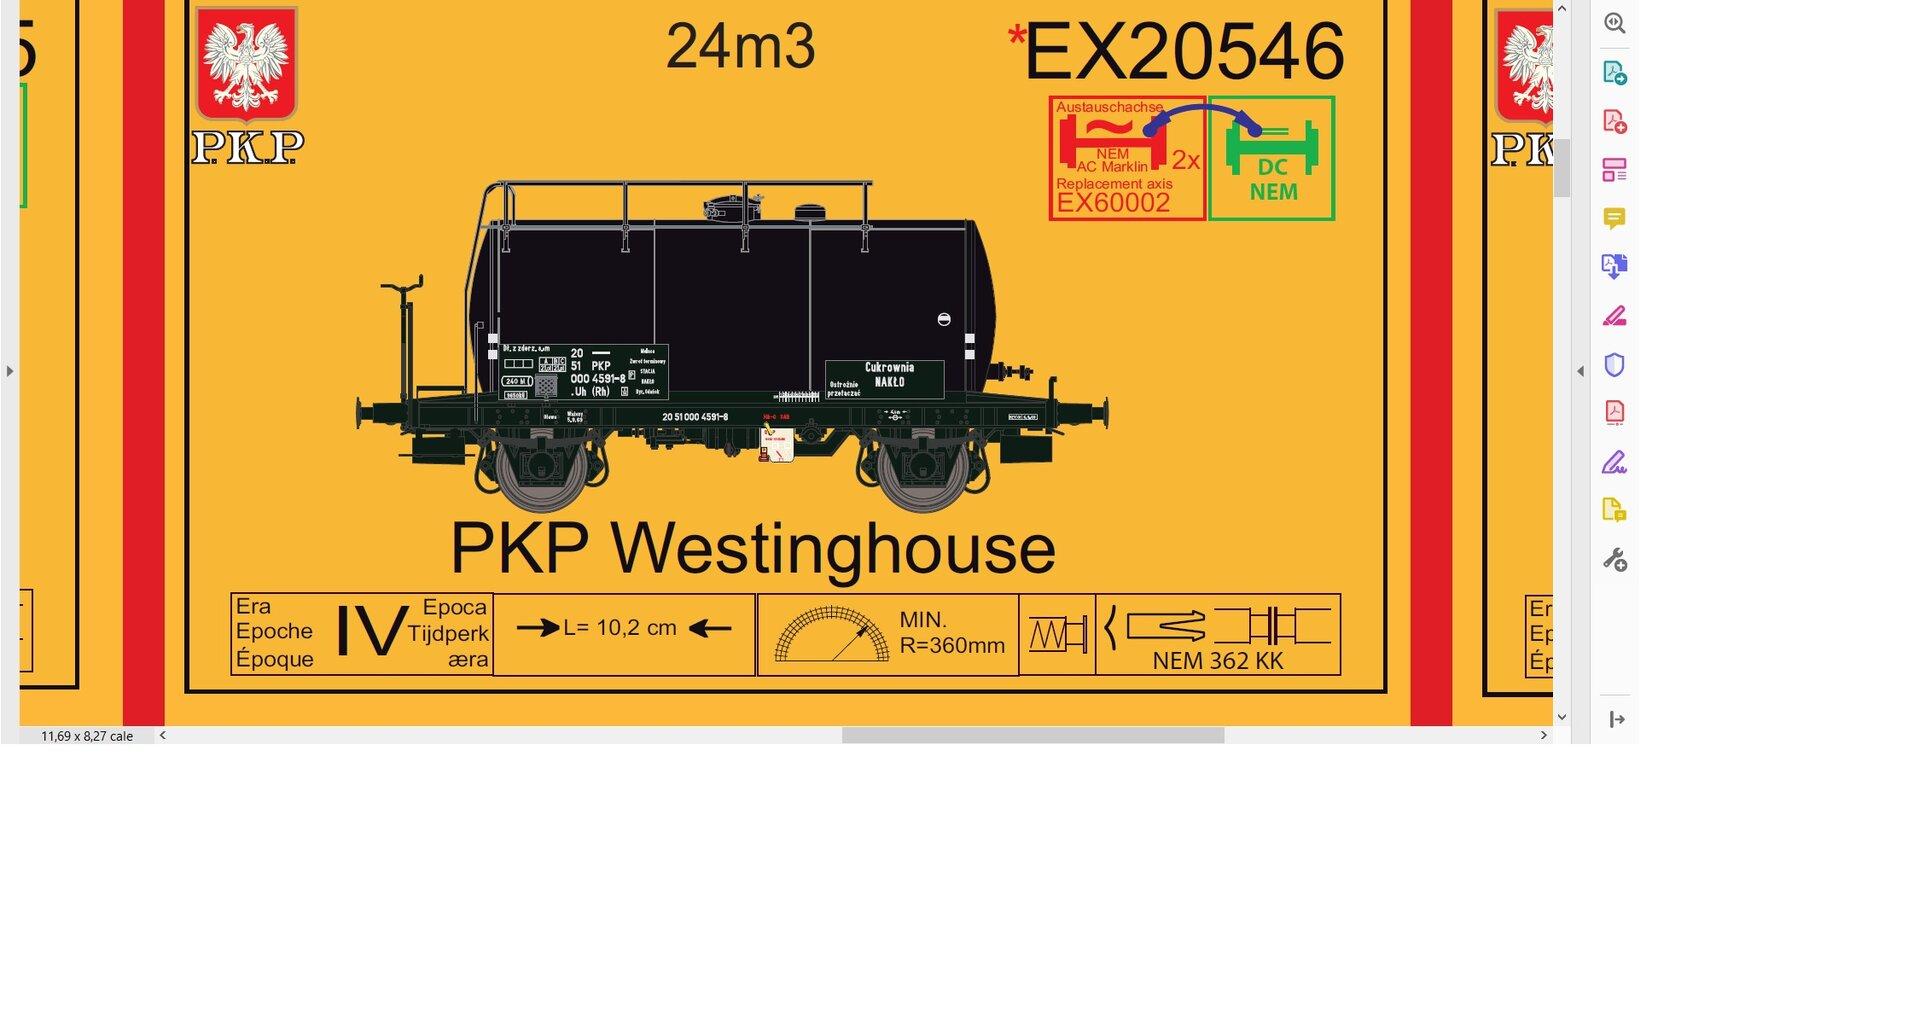 EX20546.jpg